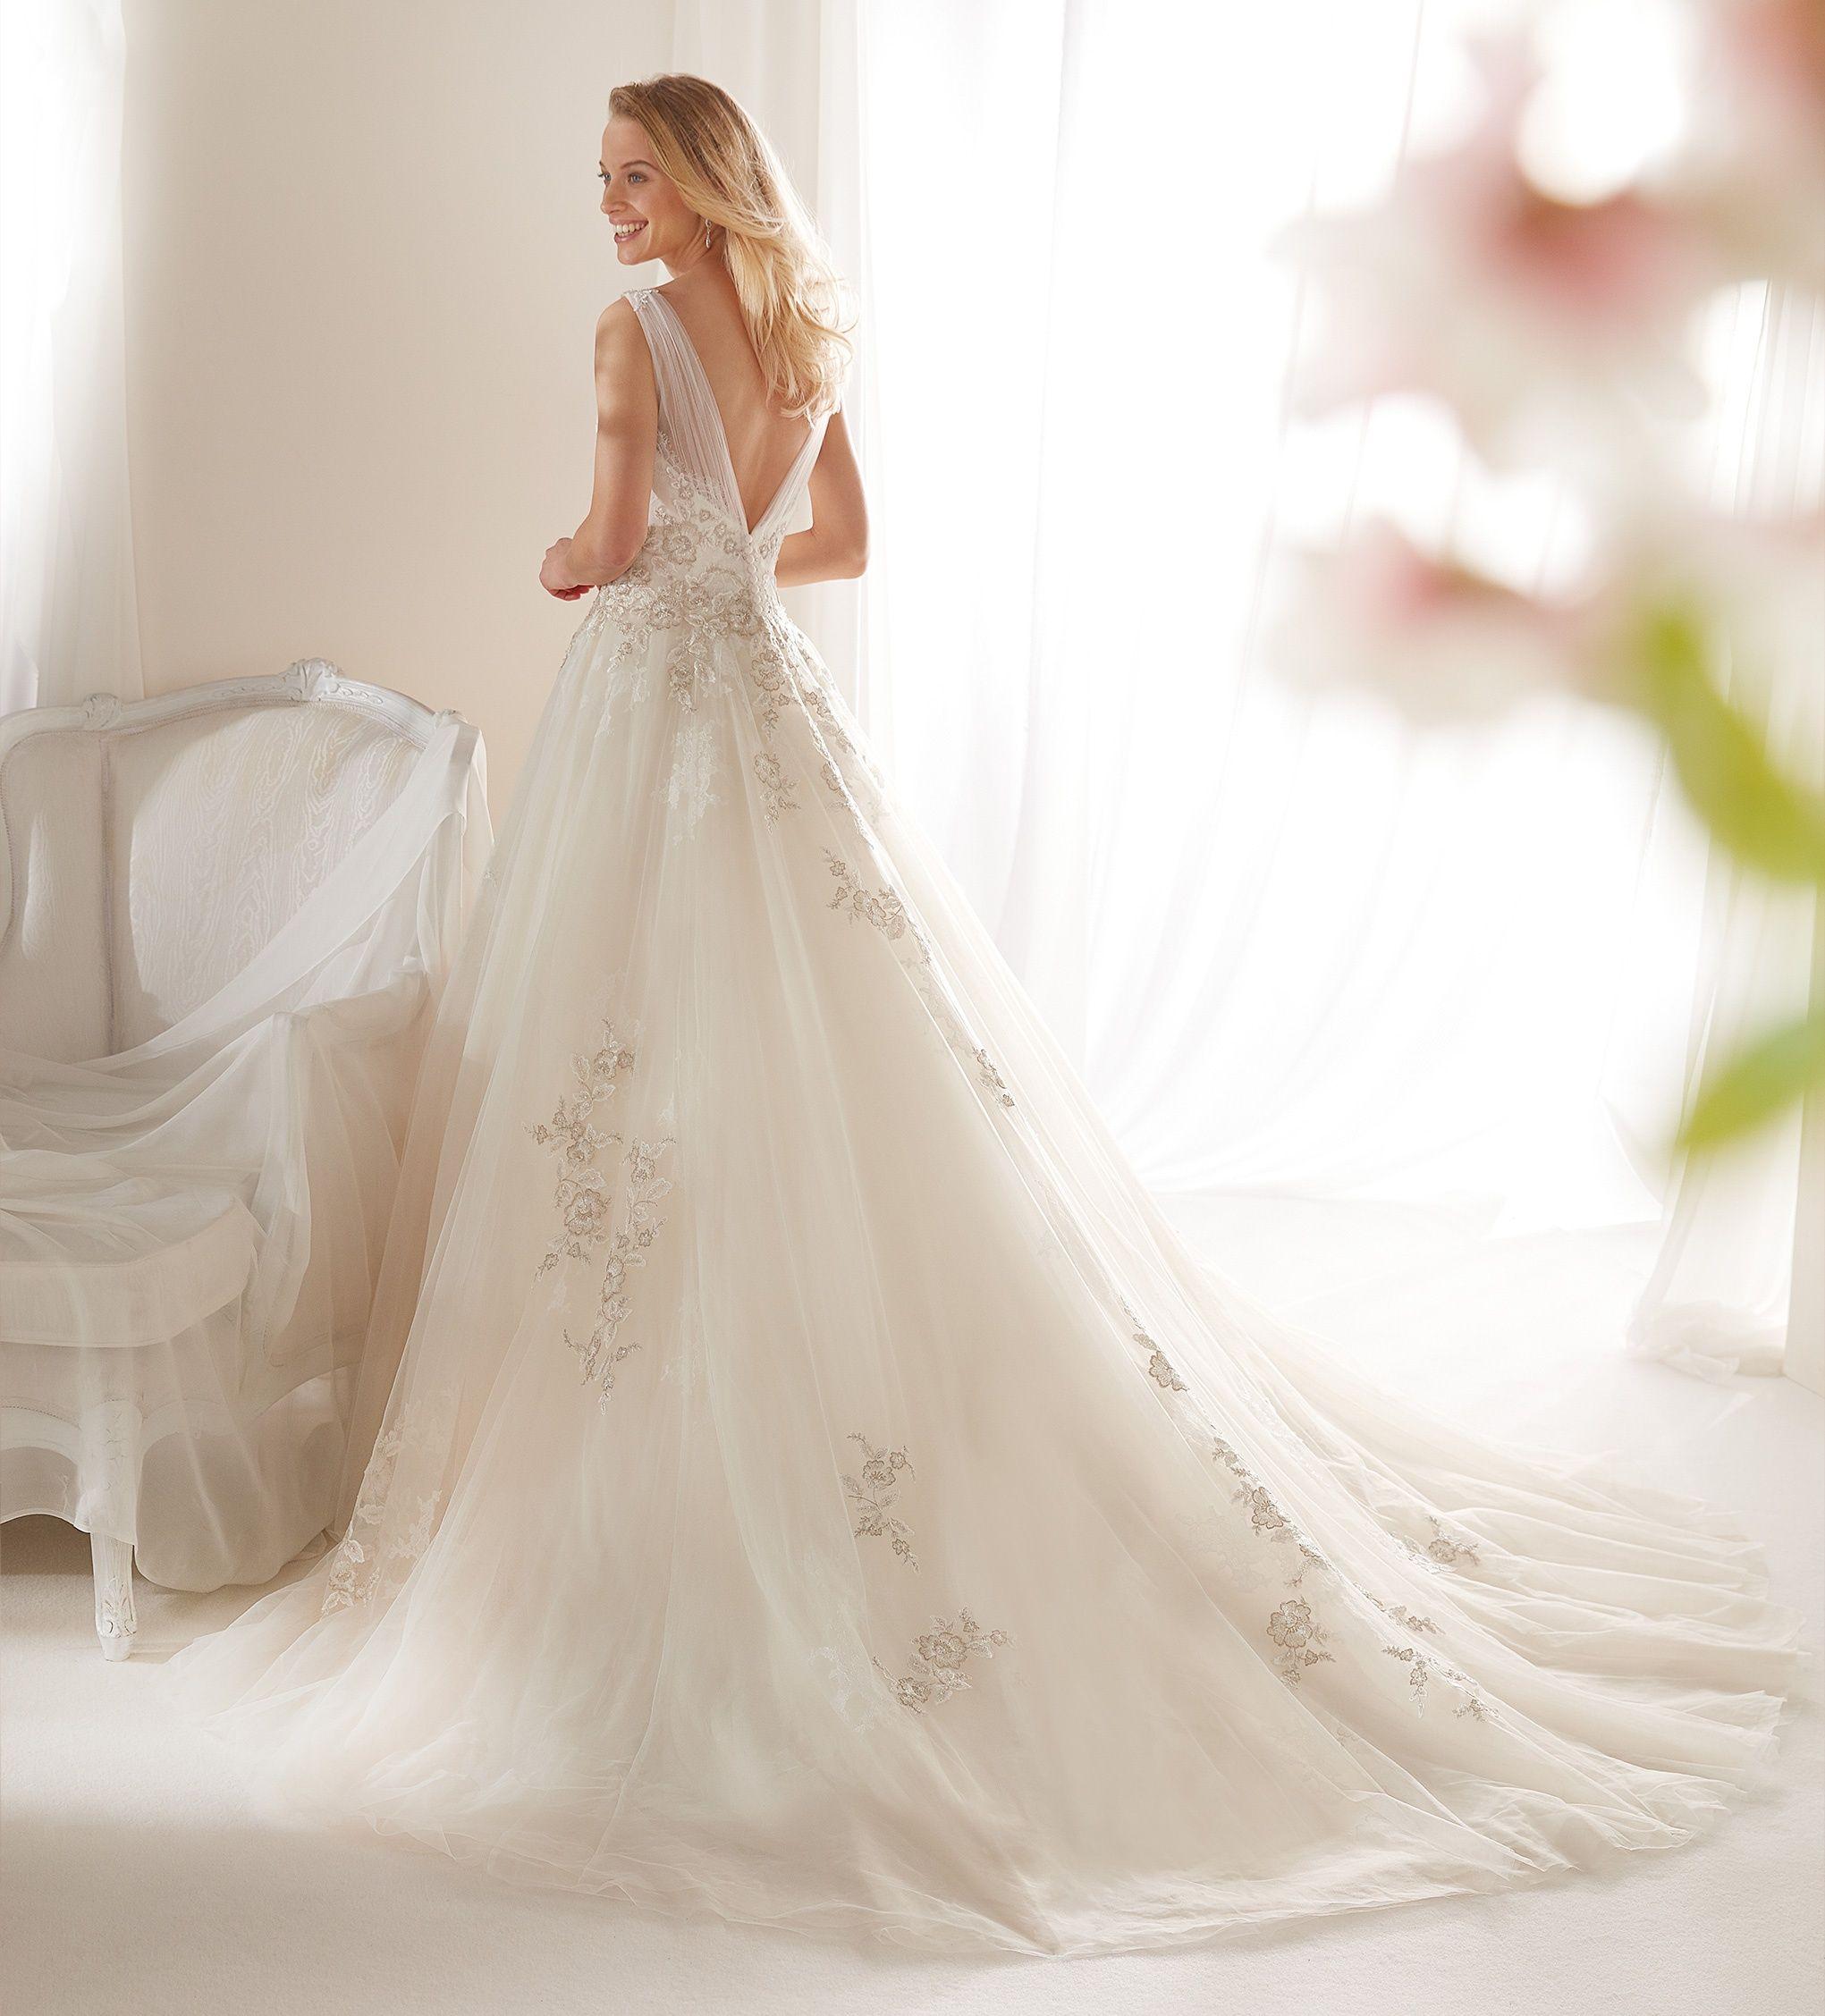 Abito Da Sposa Colet Coab19315 2019 Wedding Dresses Wedding Dresses Lace Ivory Dresses